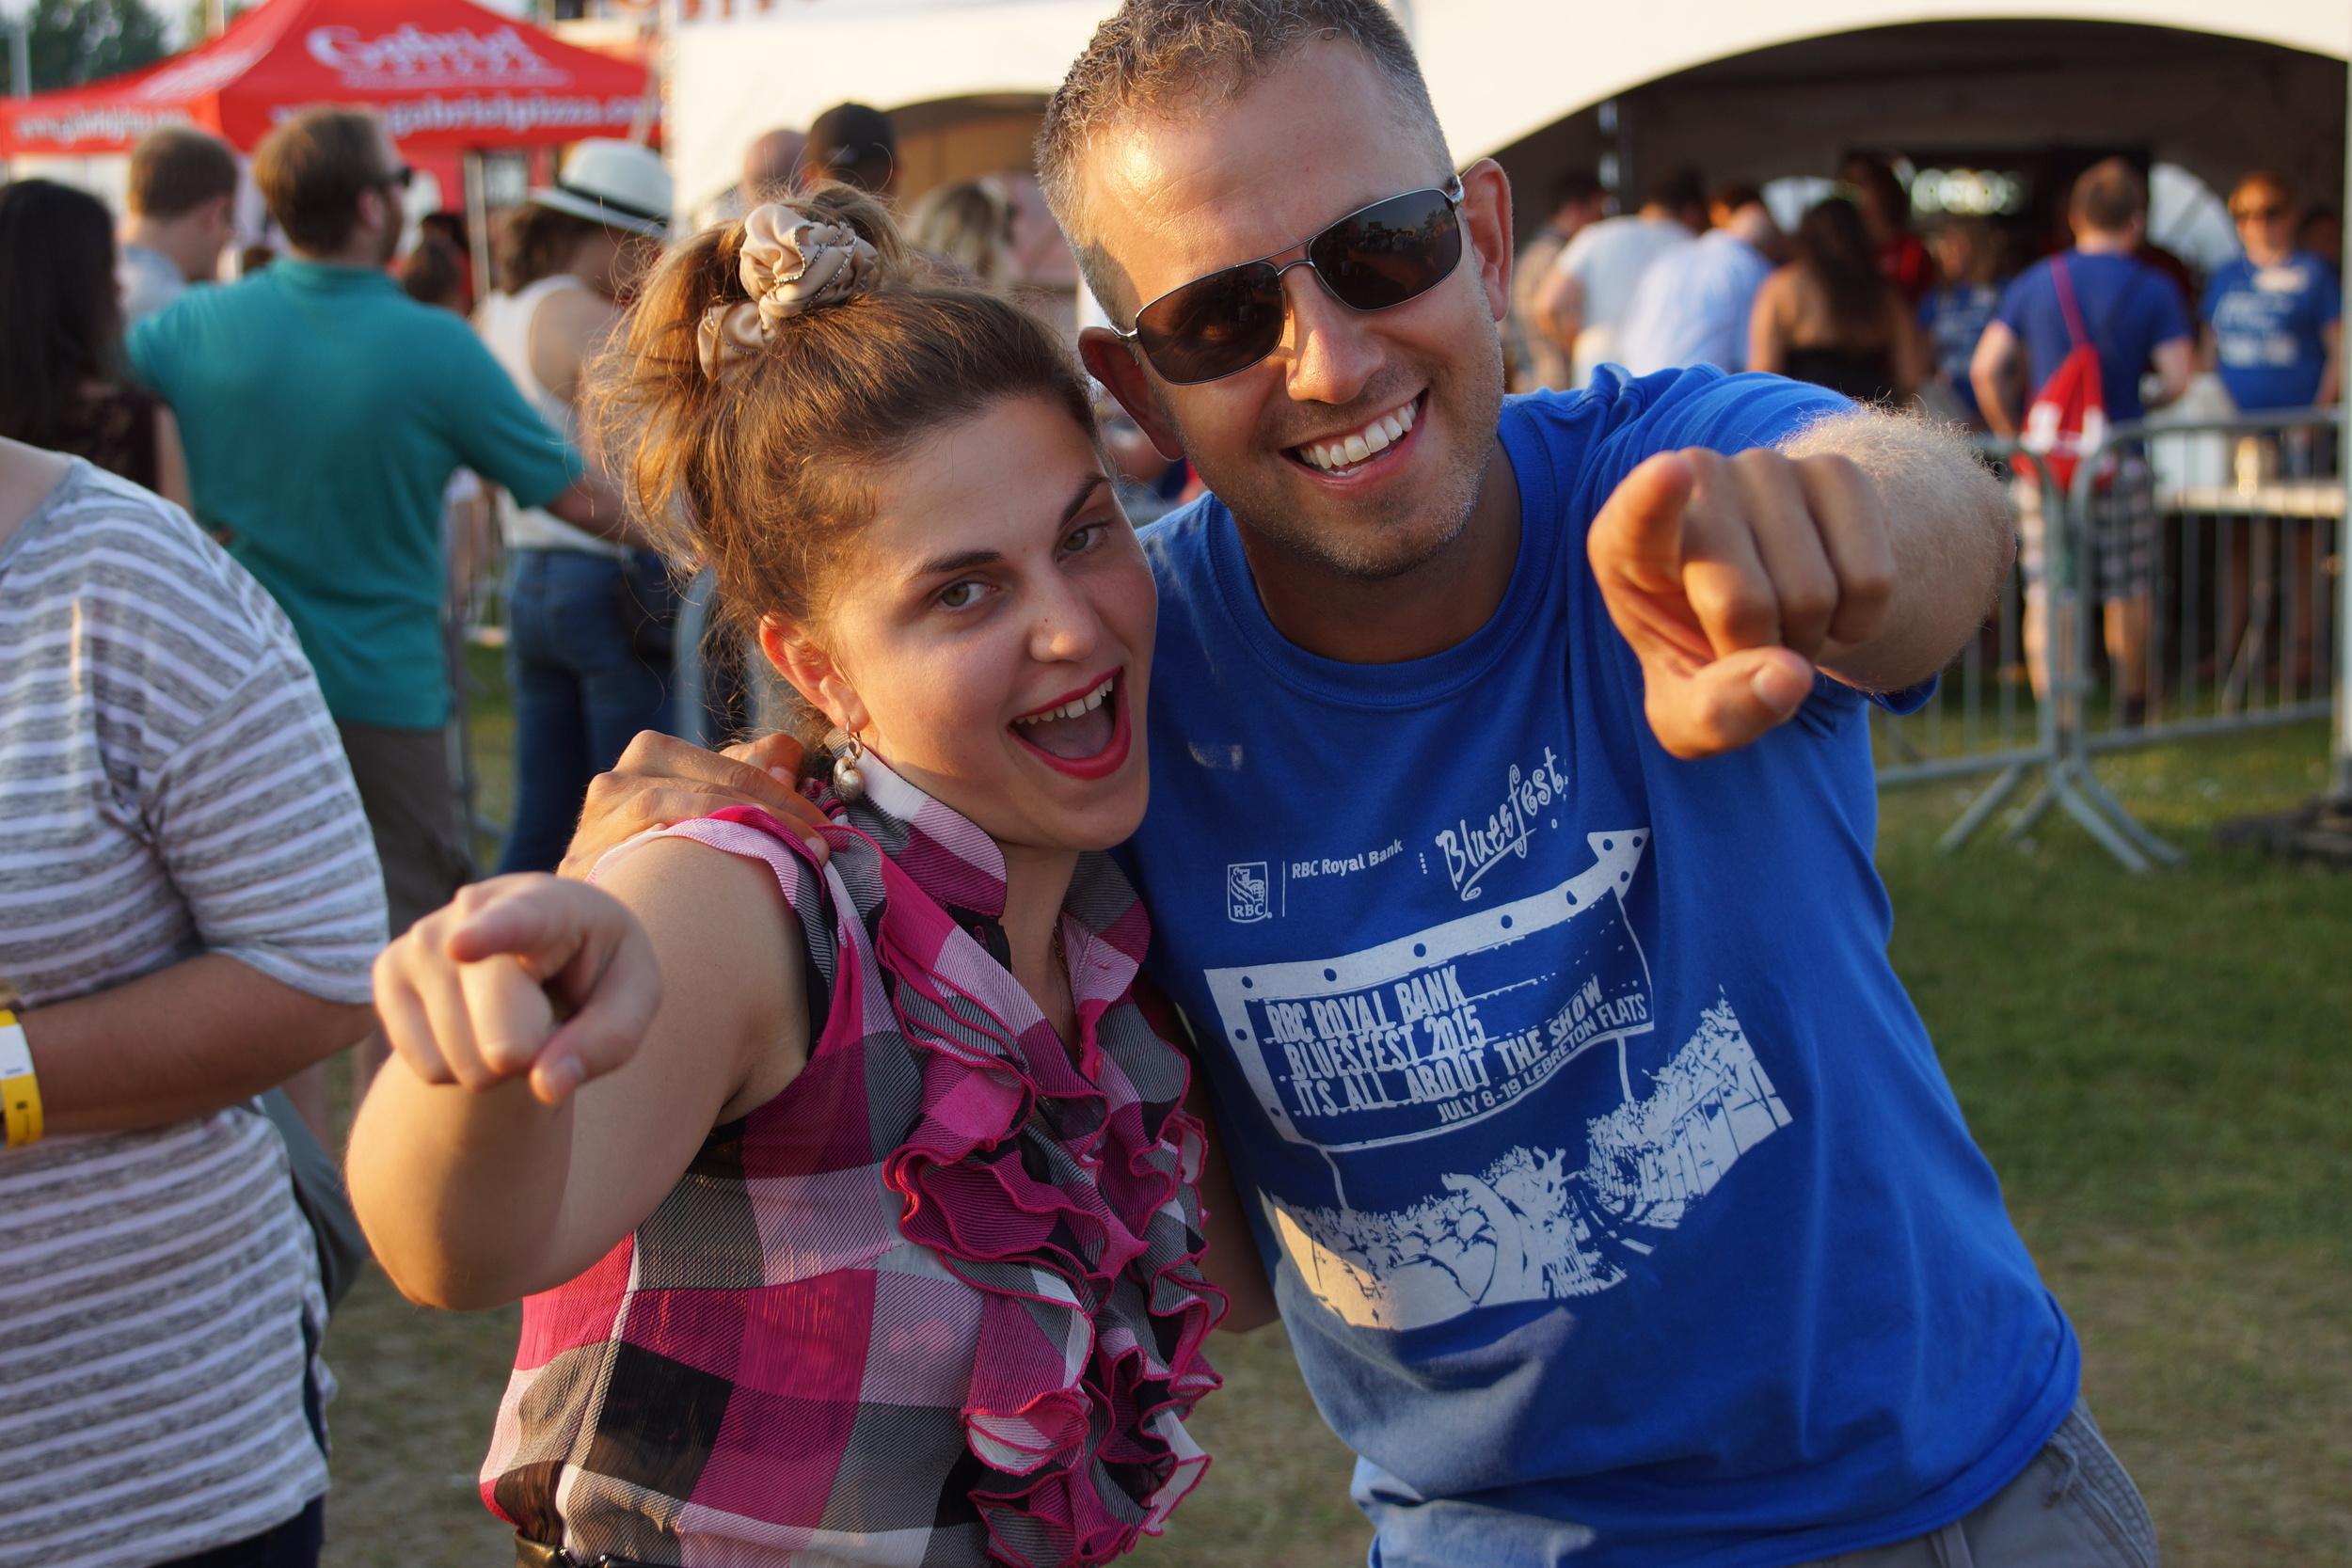 Best part of Bluesfest - Running into friends!